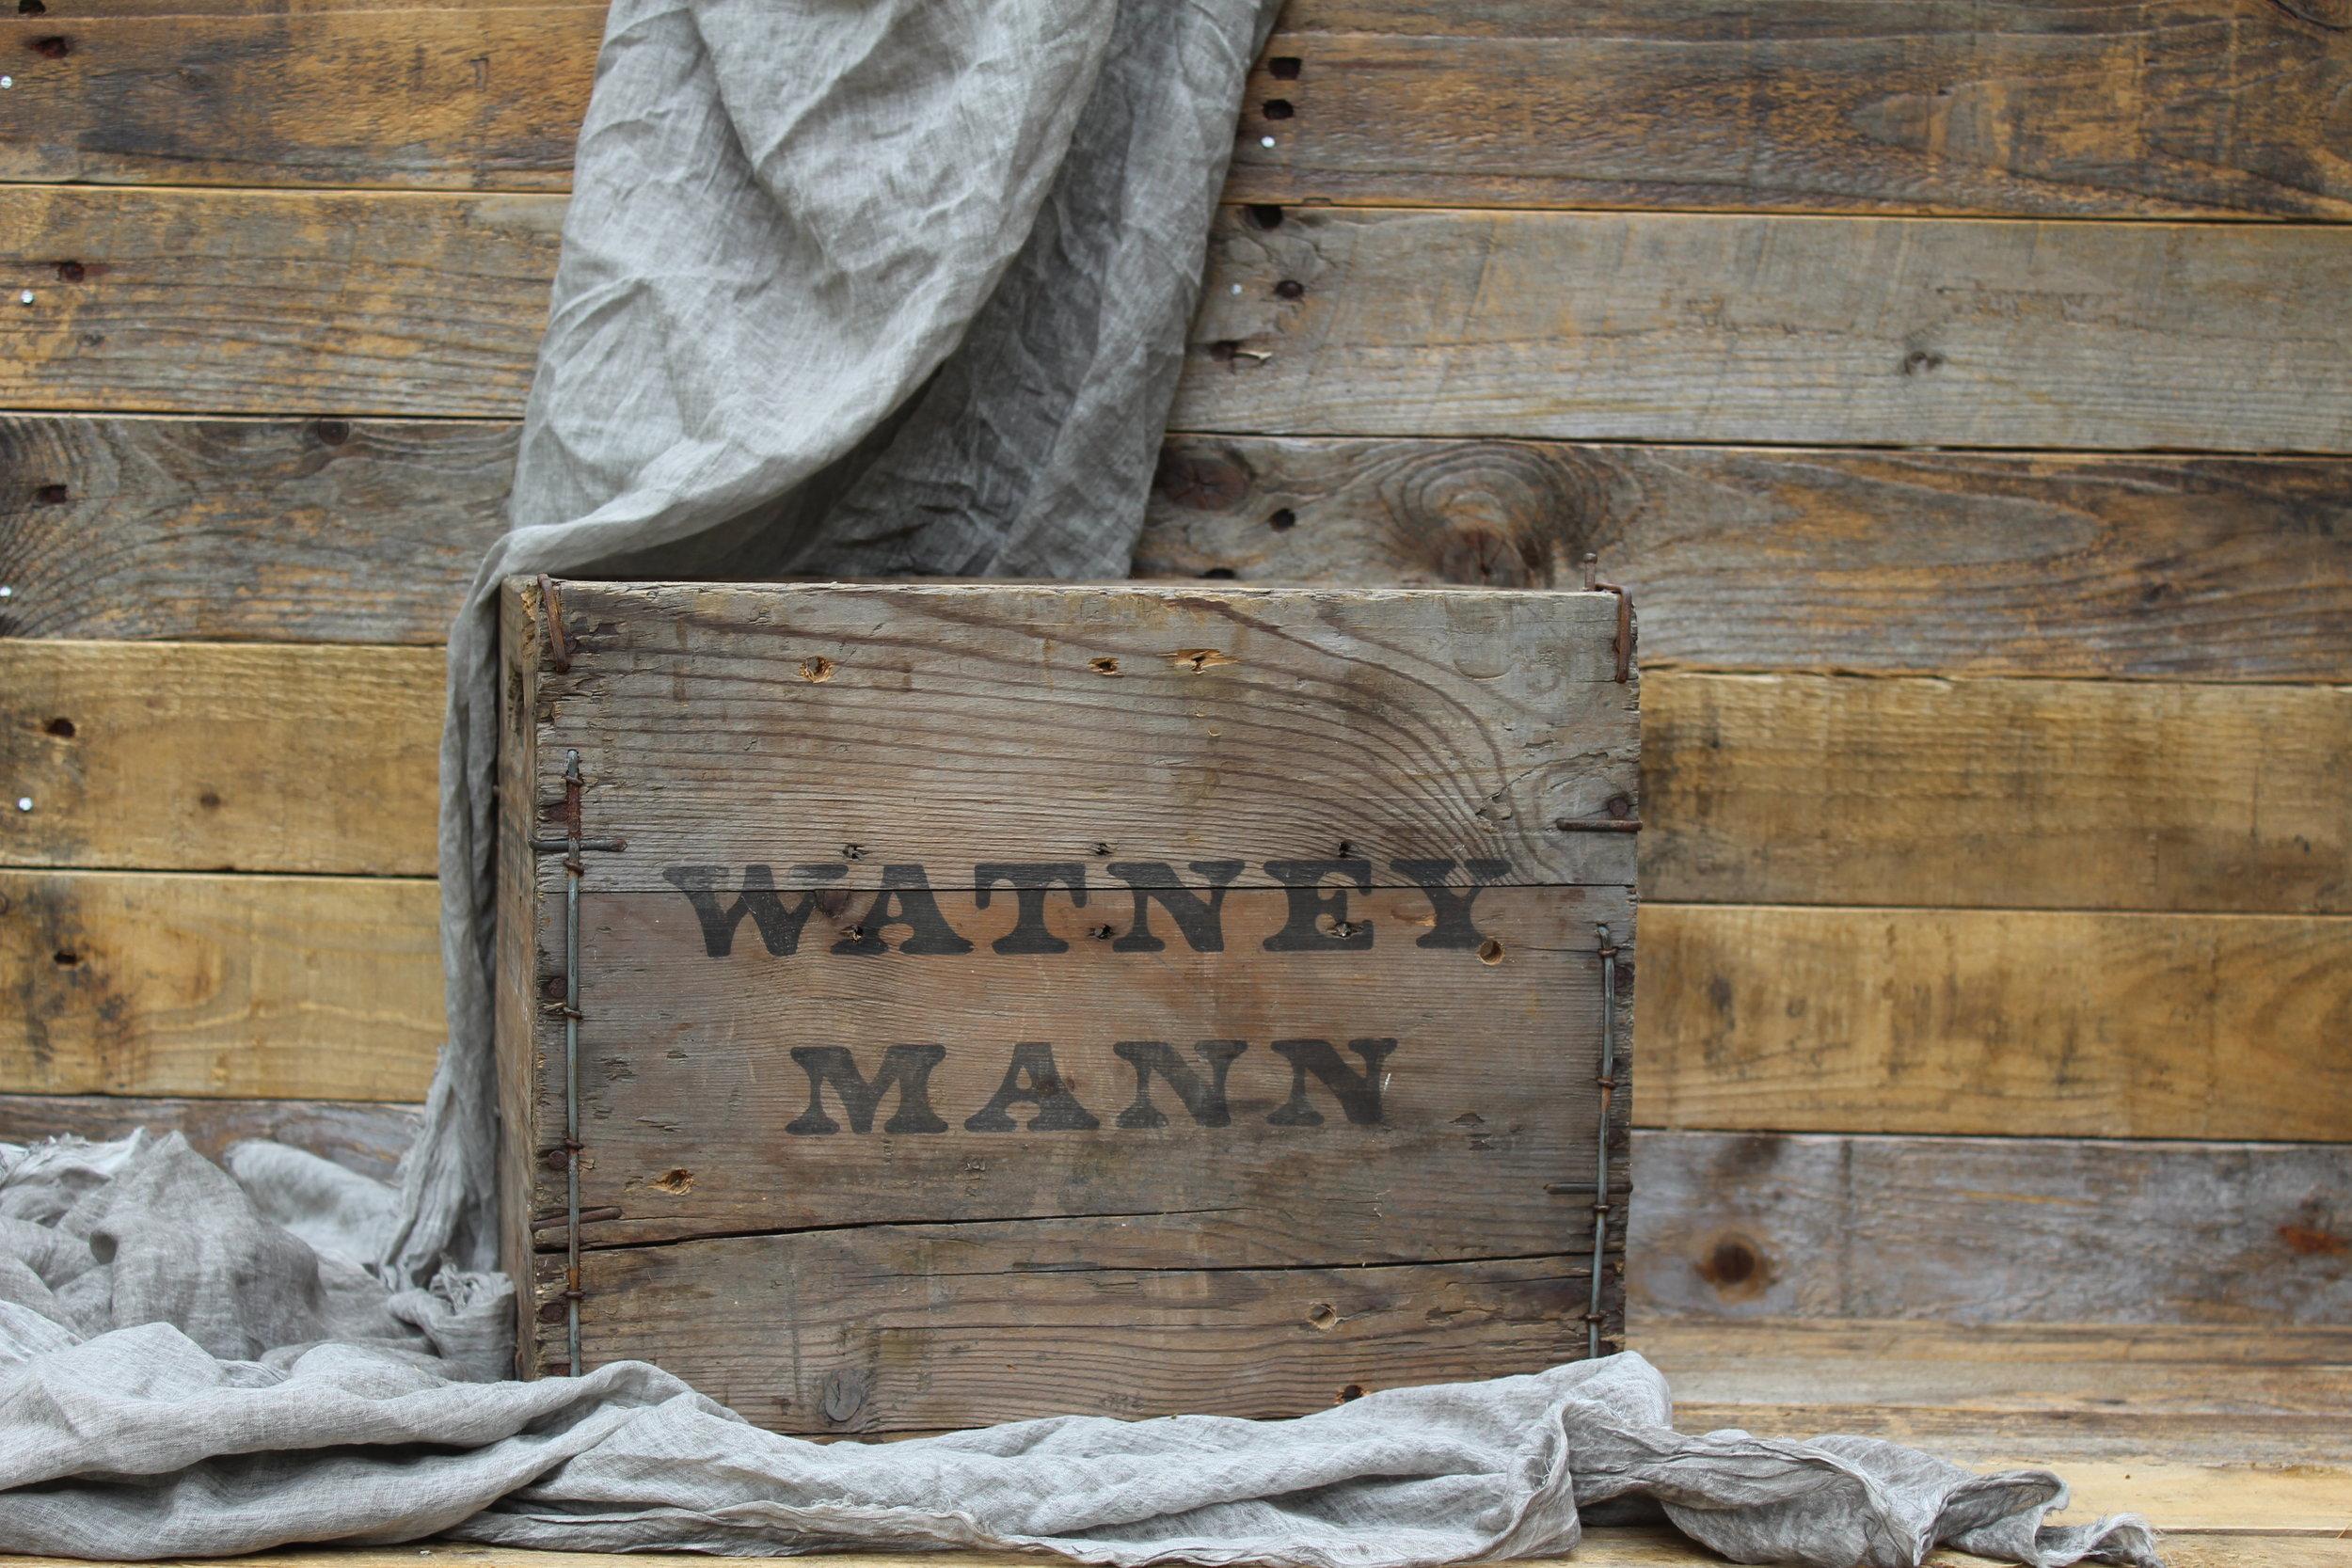 - Watney Mann crate 37cm x 30cmx3 £5 each